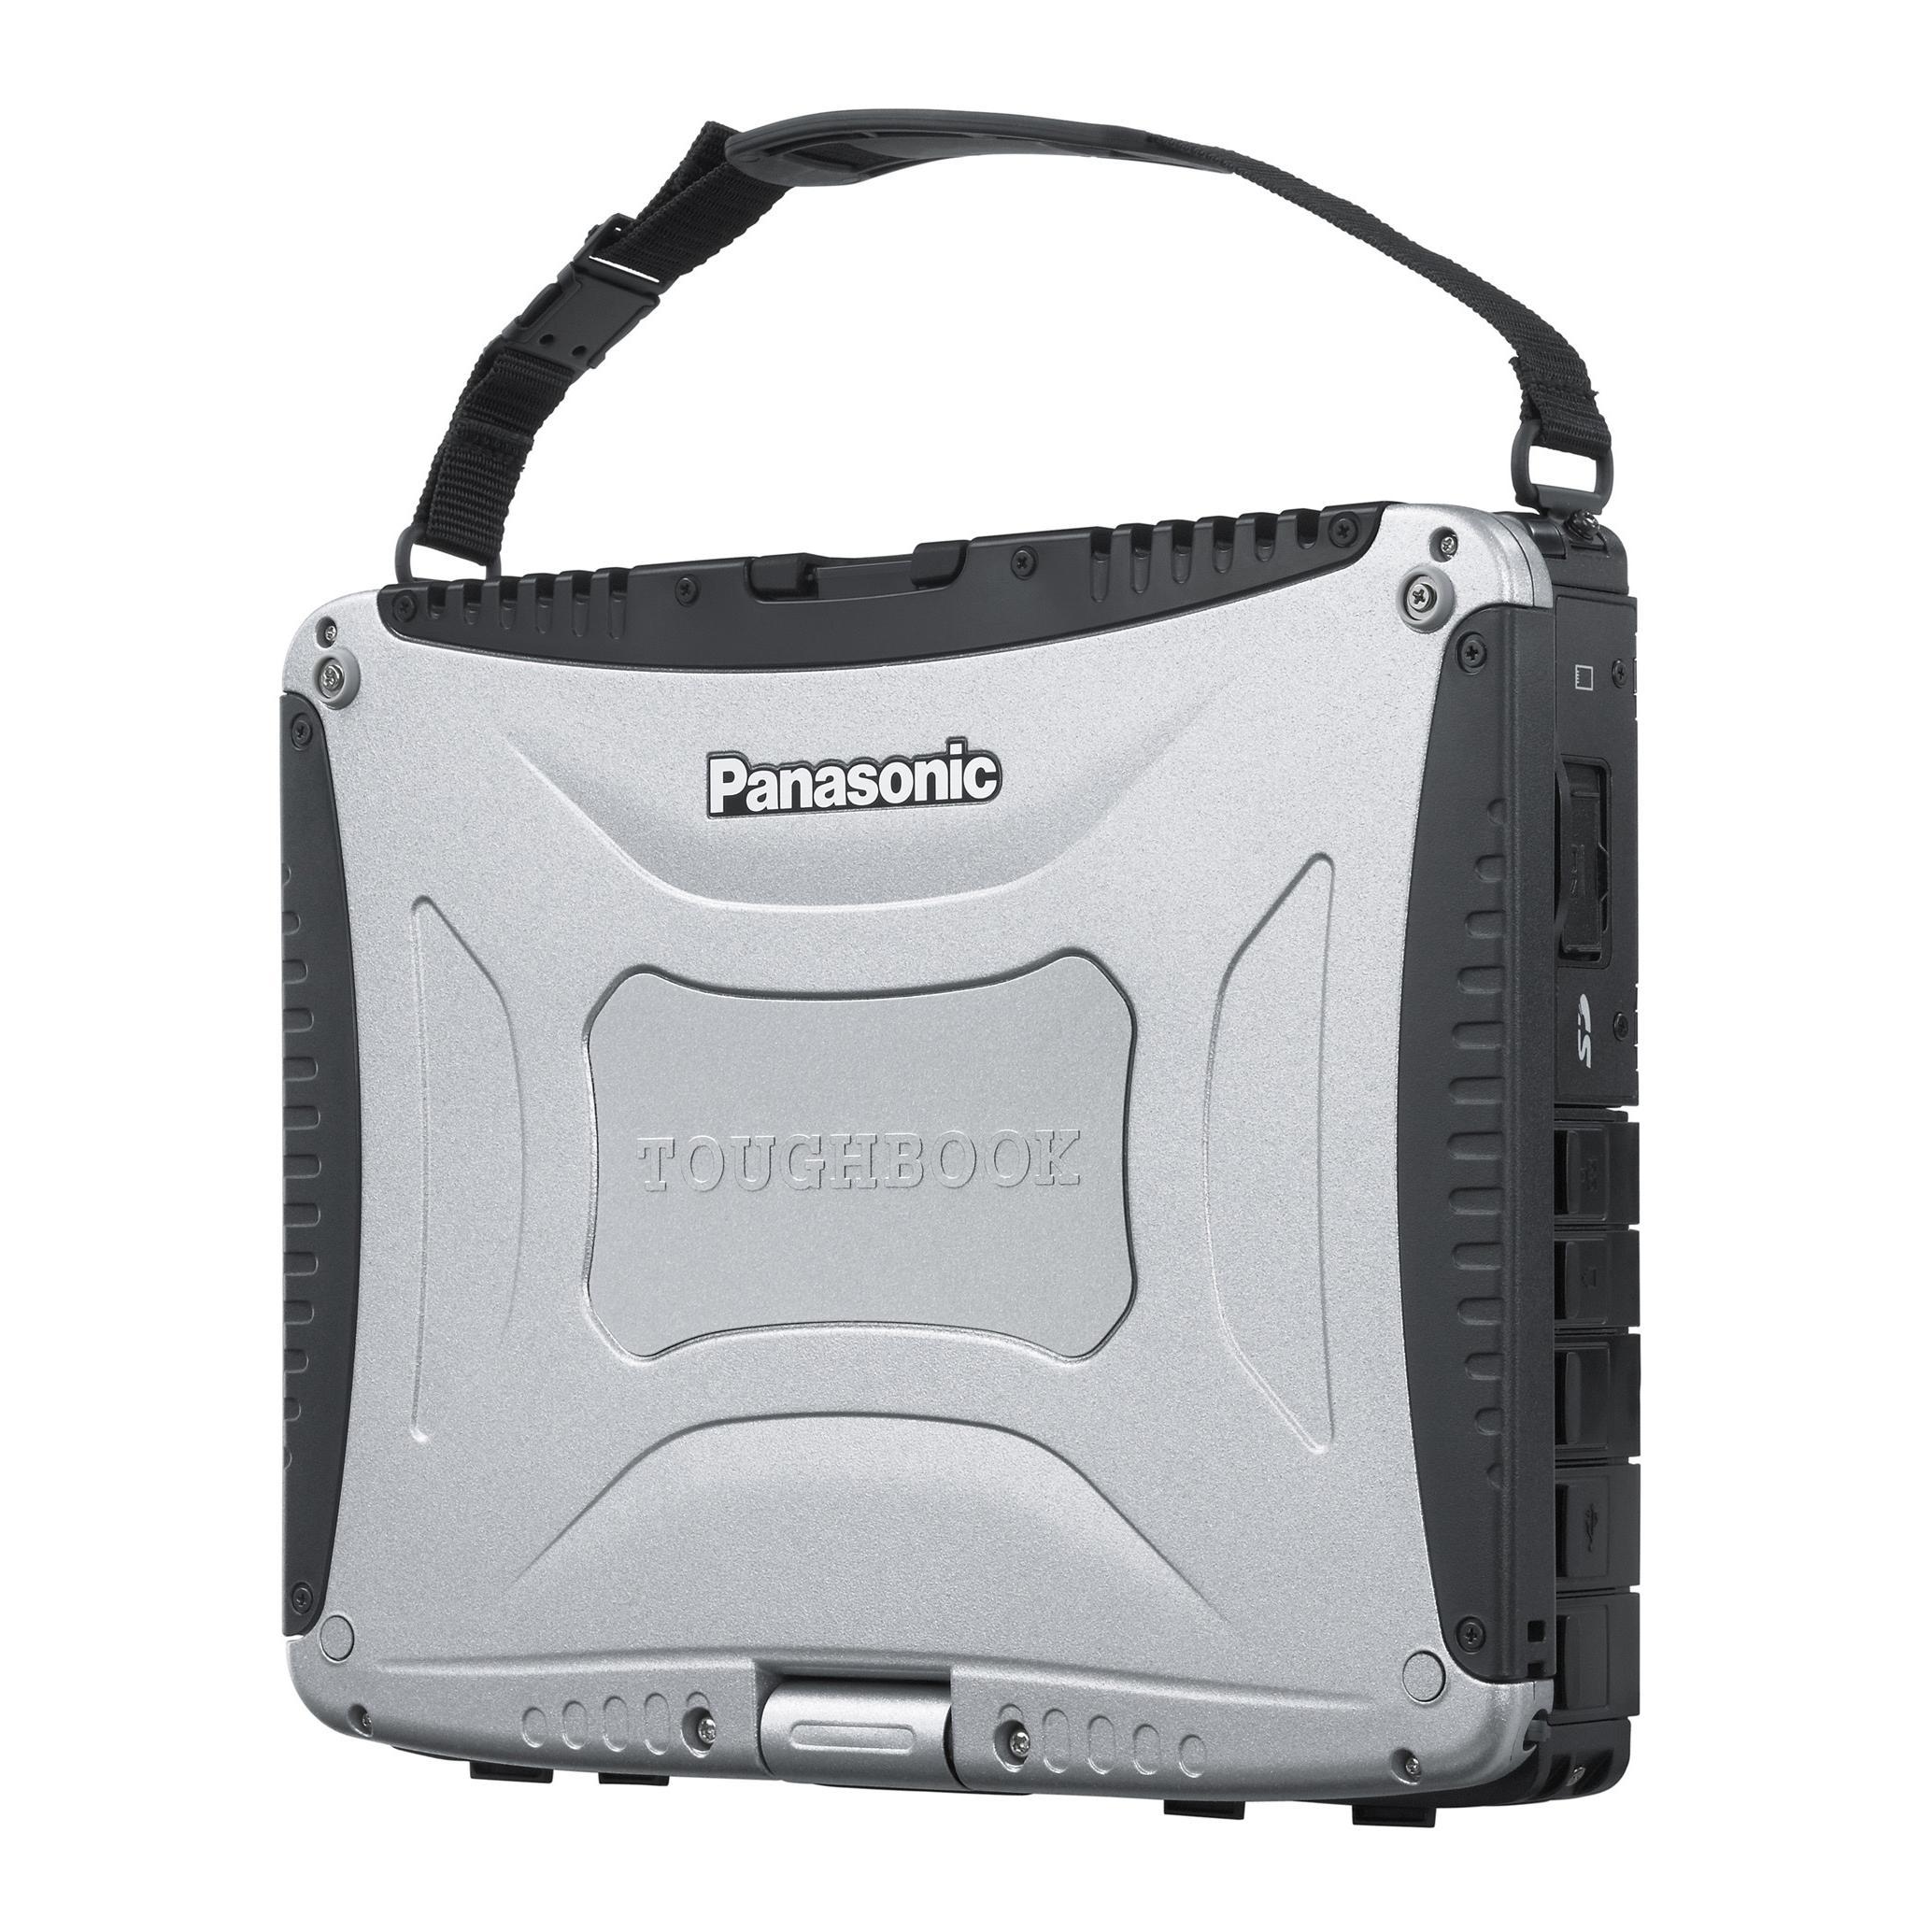 "Panasonic CF-19 MK3 10,4"" () - Core 2 Duo U9300 - 4GB - SSD 100 GB AZERTY - Francúzska"